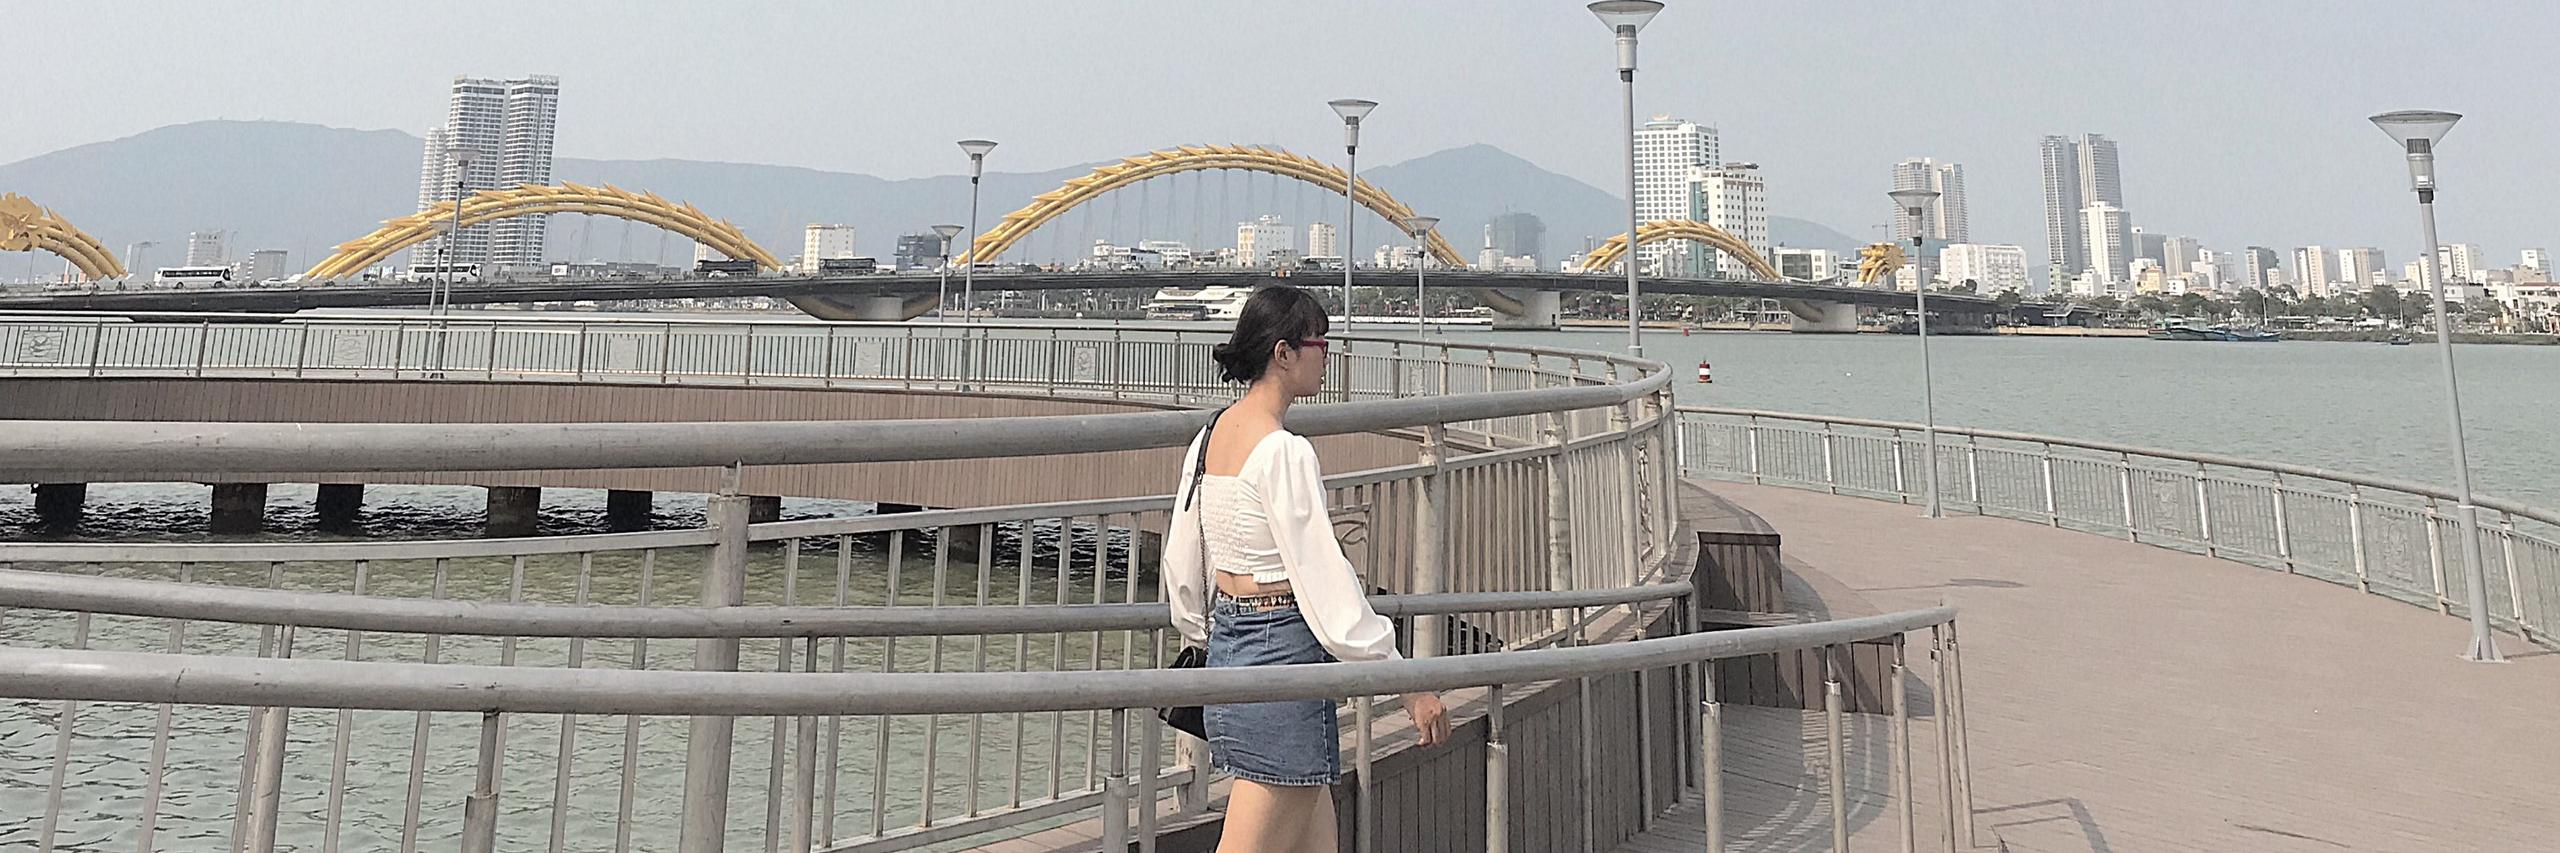 https://gody.vn/blog/congchua_mauhong803174/post/goc-check-in-moi-o-da-nang-voi-view-ngam-tron-cau-rong-8887